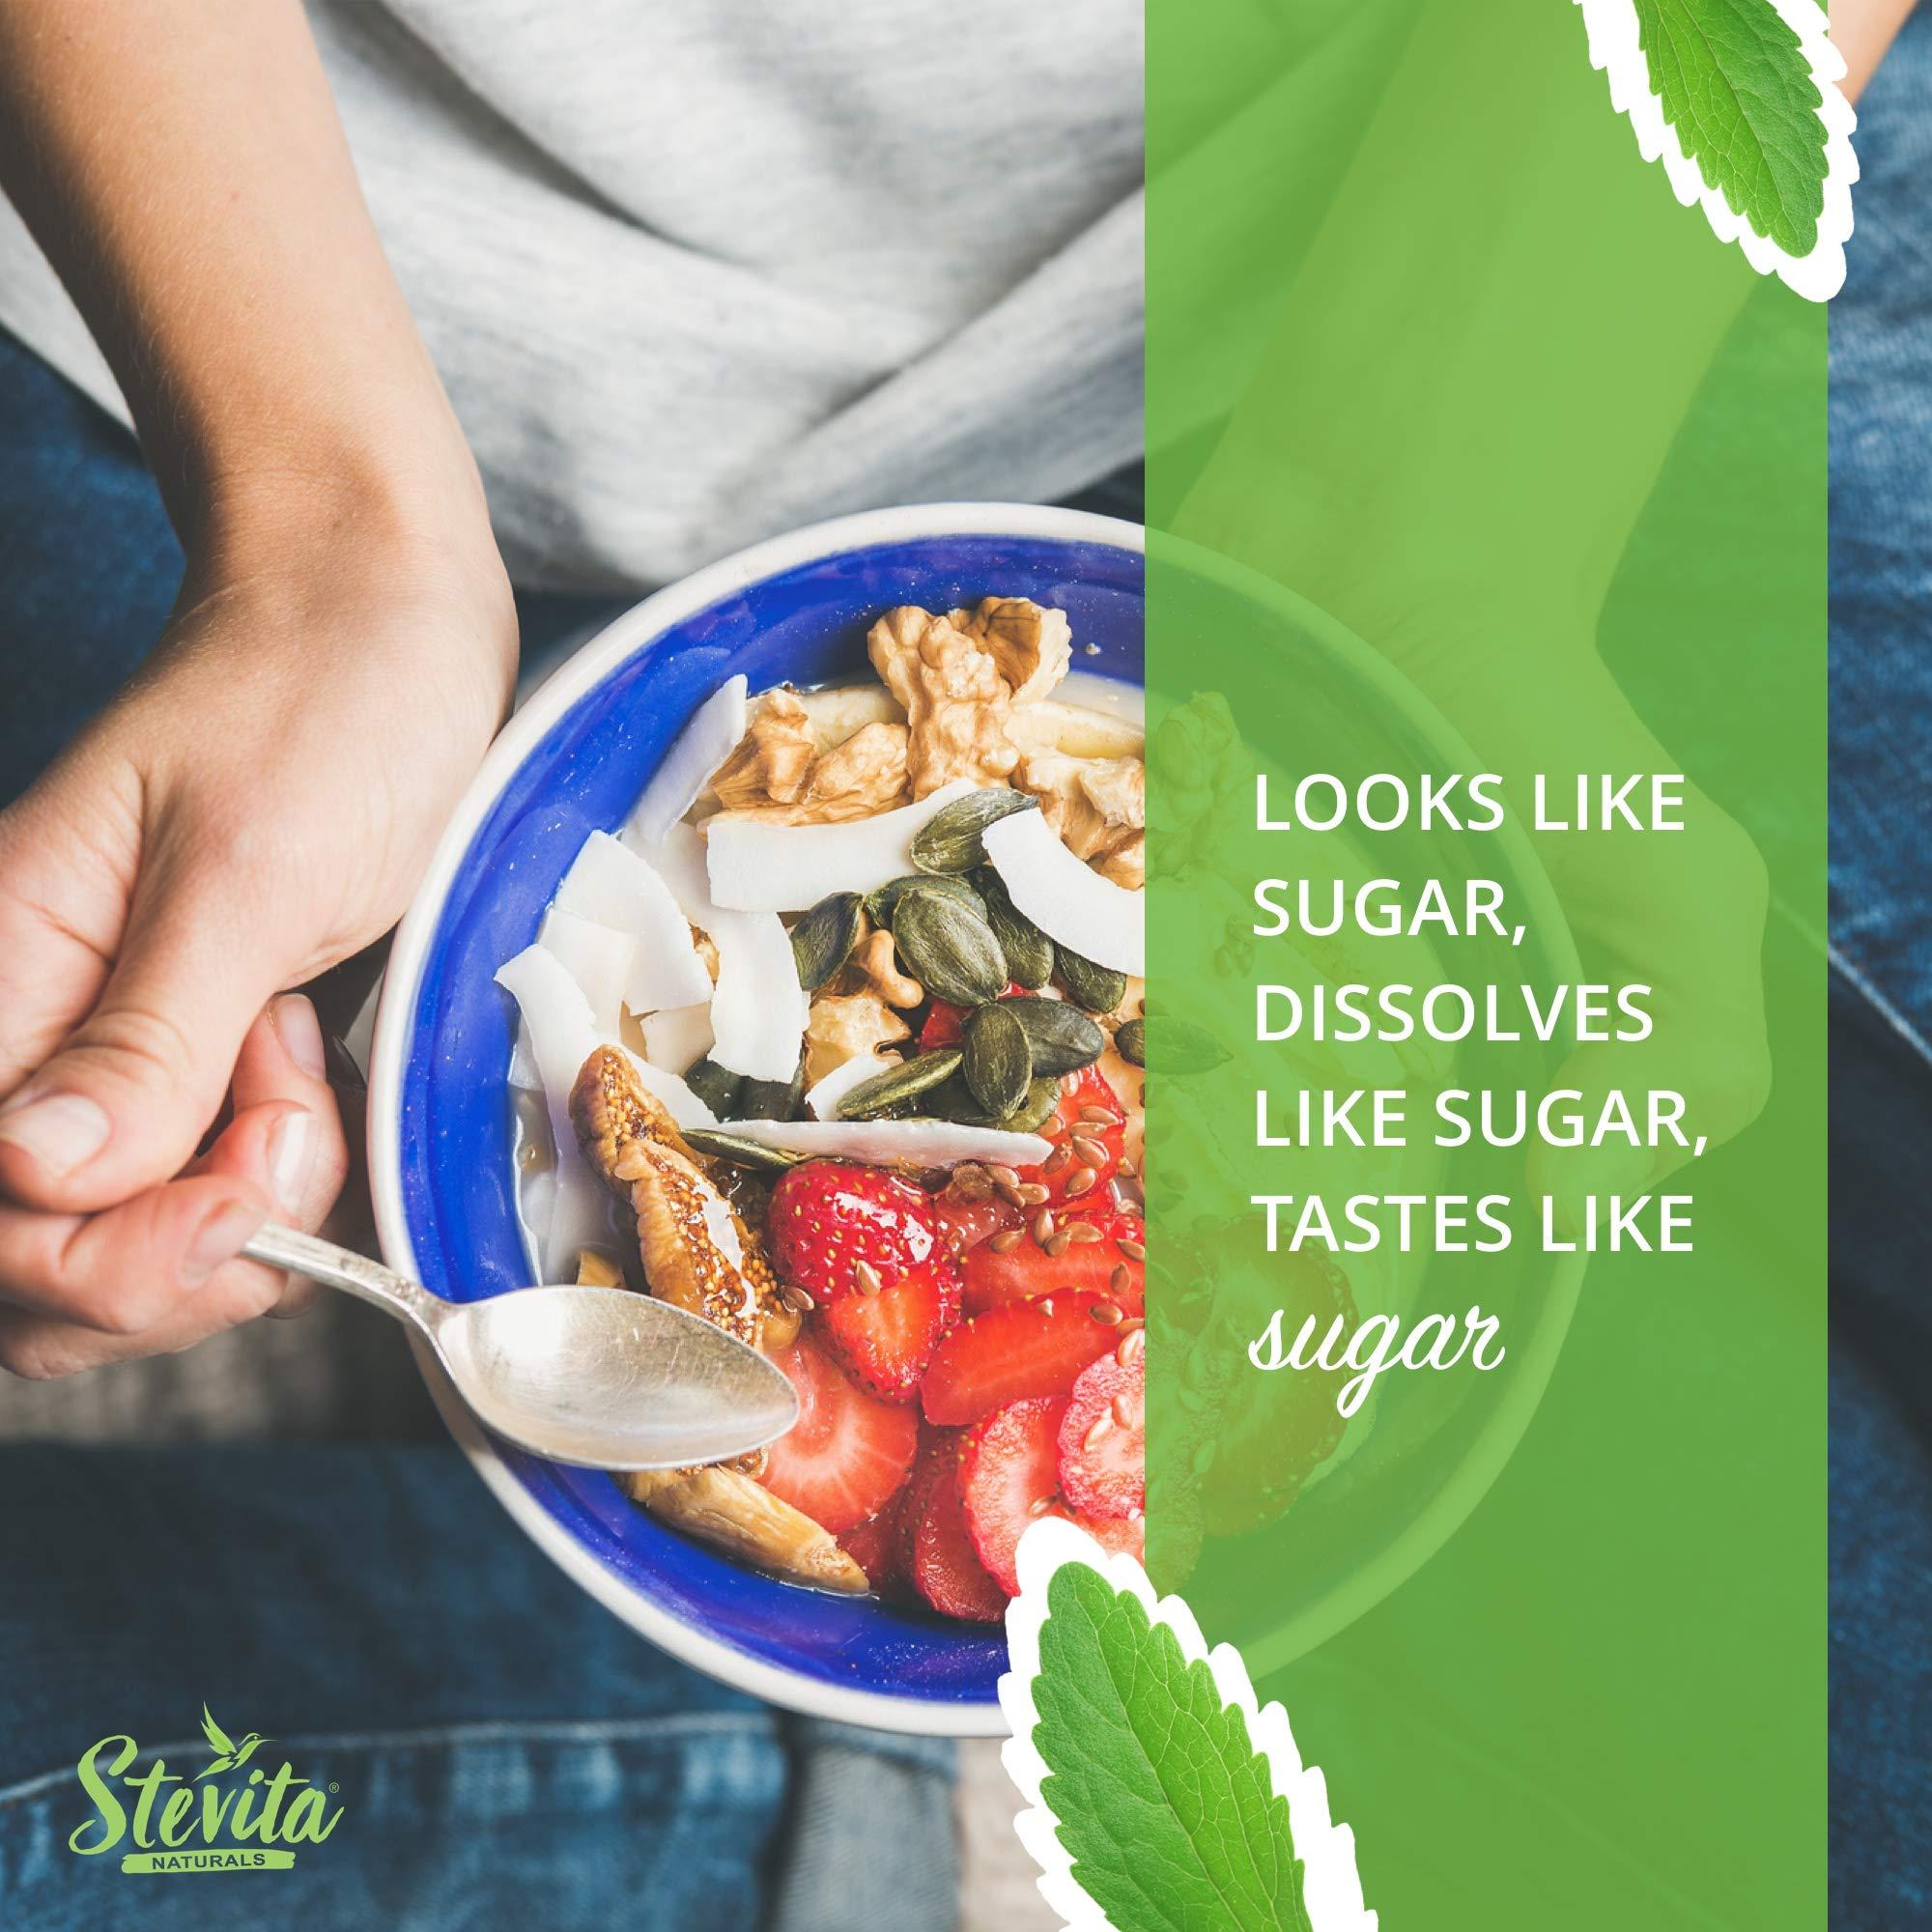 Stevita Stevia Organic Spoonable Stevia Powder - 50 Packets - Stevia & Erythritol All Natural Sweetener, No Calories - USDA Organic, Non GMO, Vegan, Keto, Paleo, Gluten-Free - 50 Servings by STEVITA (Image #4)